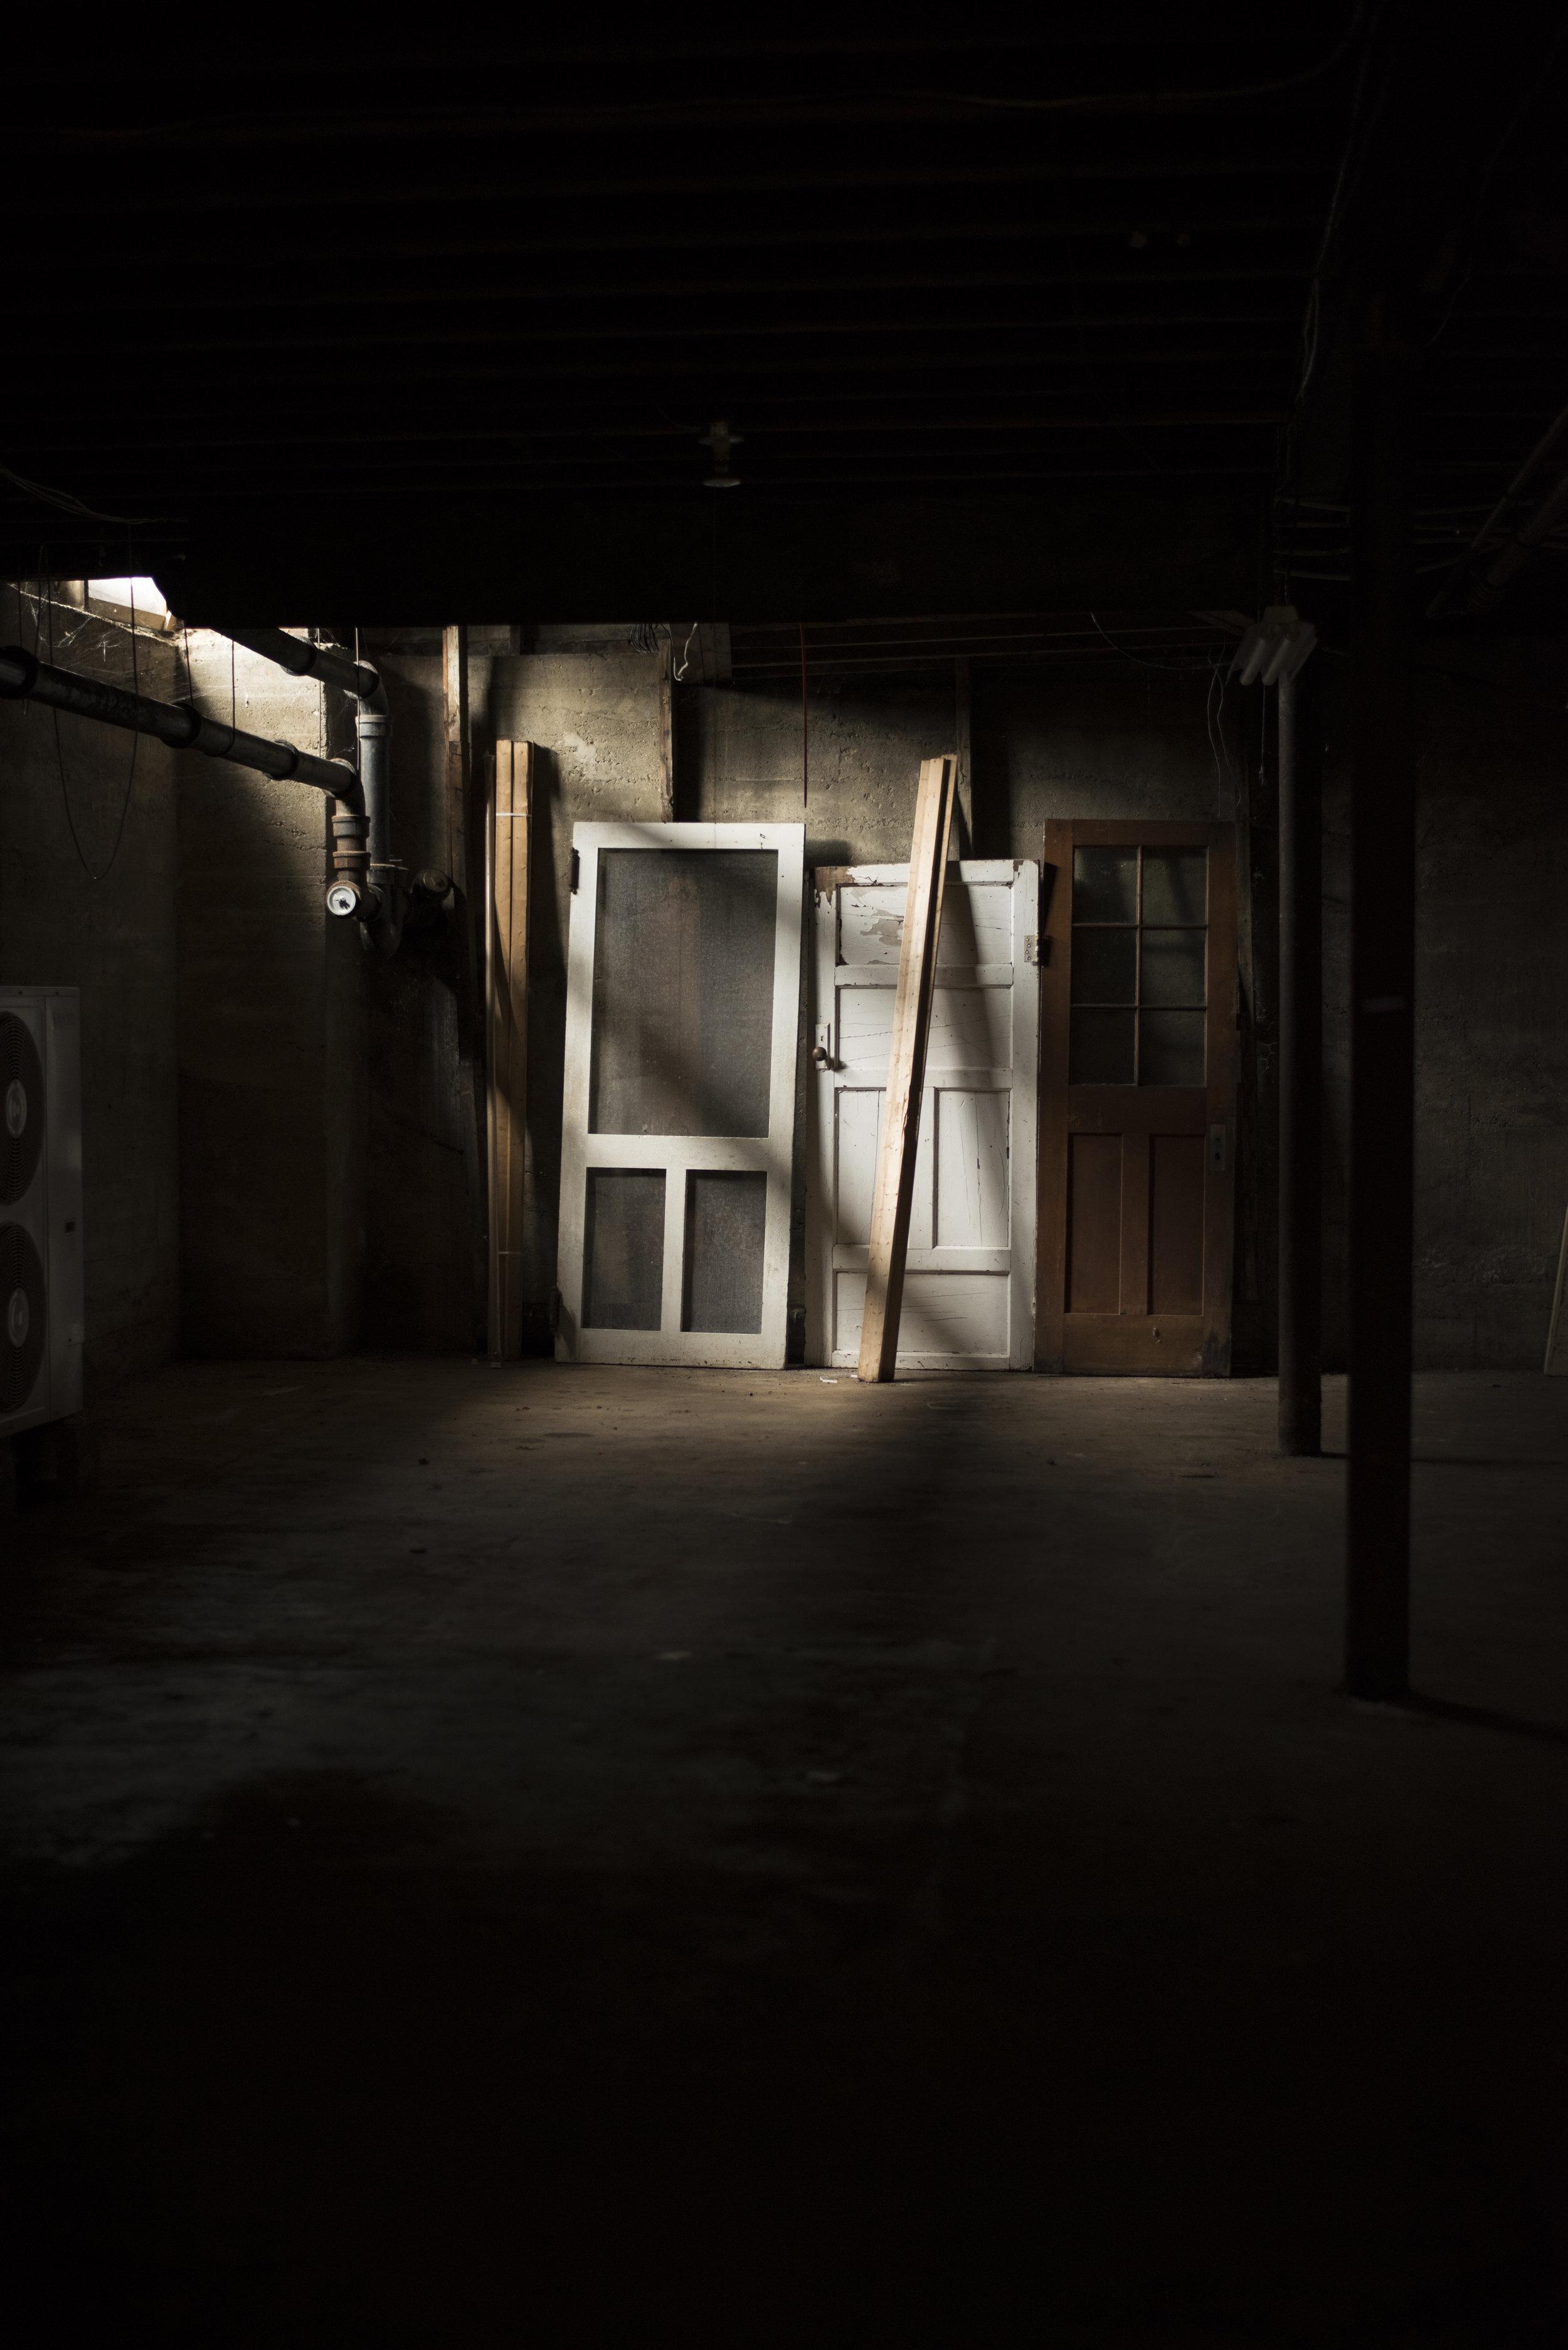 portals_in_the_dark_28028464168_o.jpg